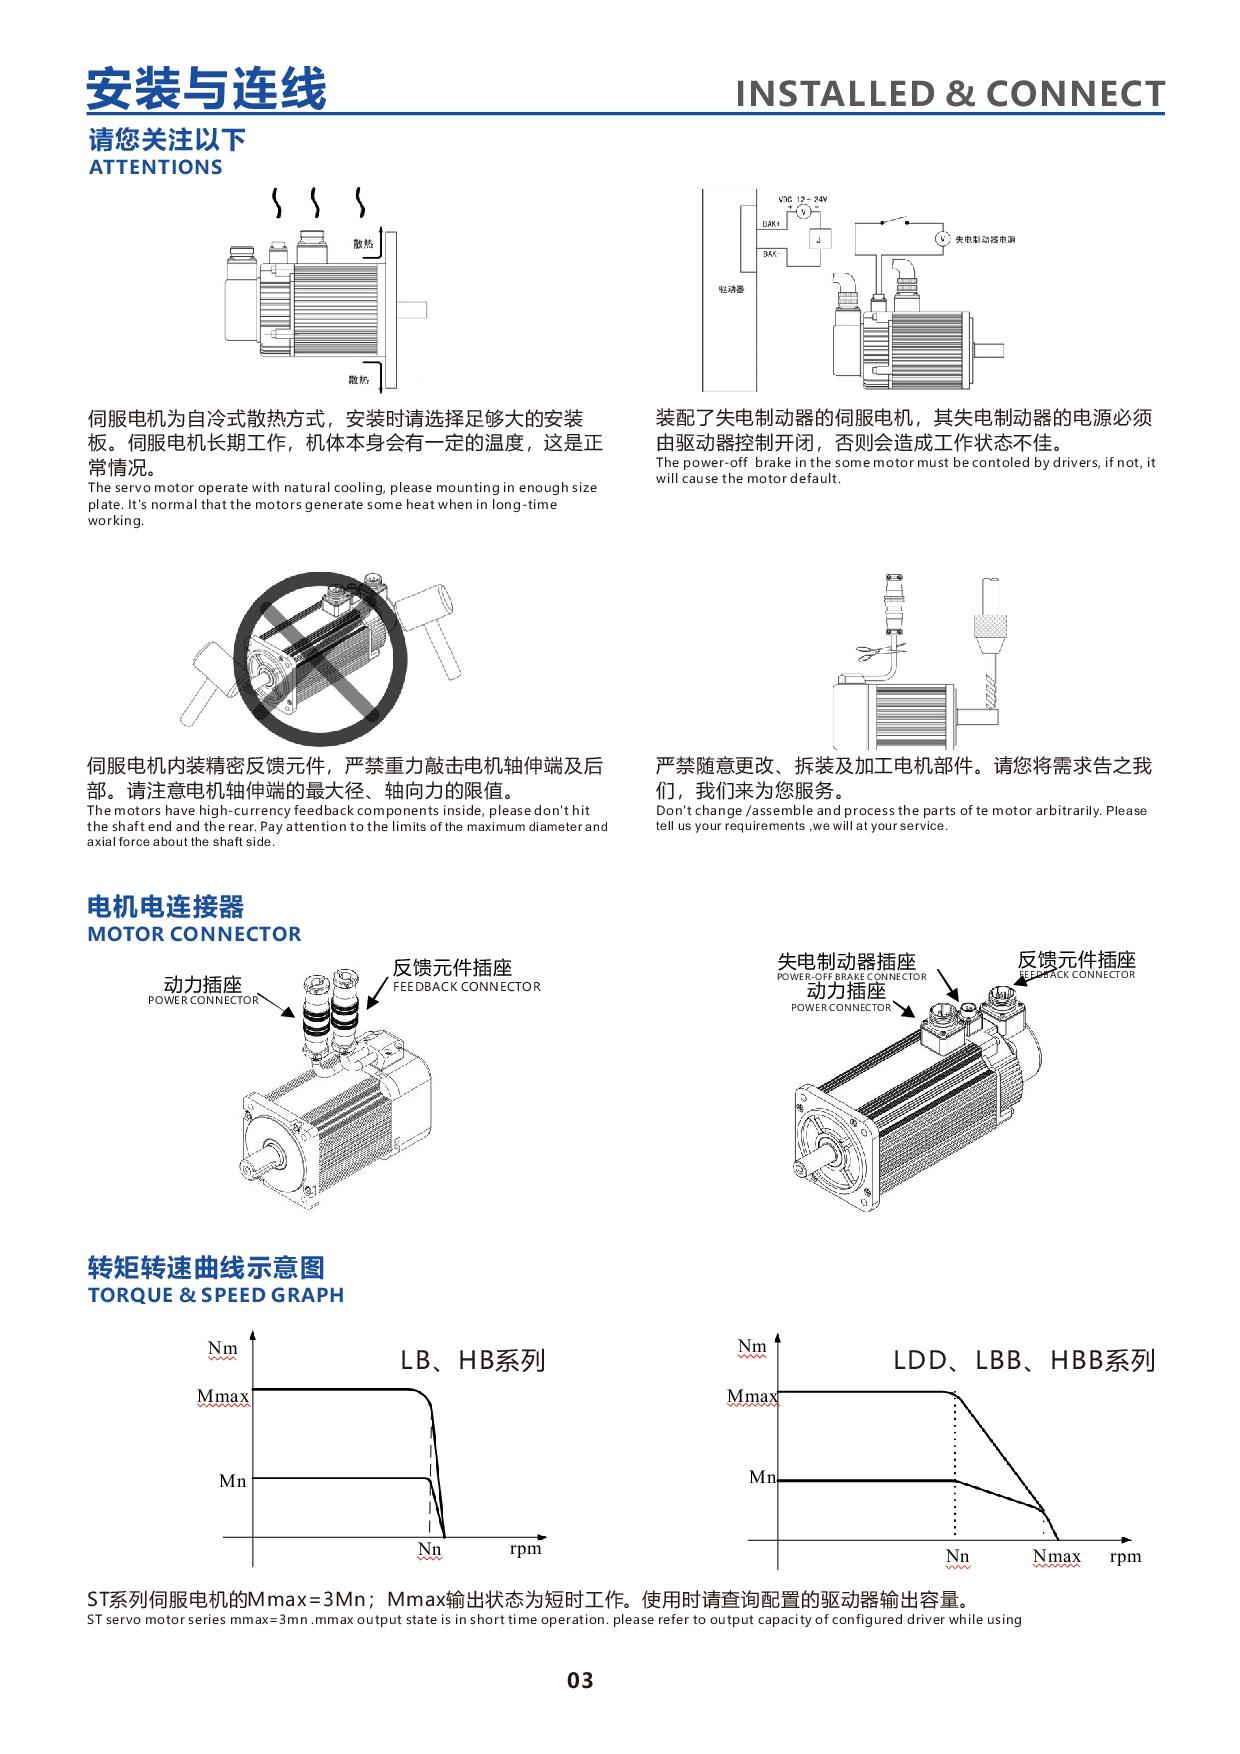 產品特性-1-HXDWH-1-installedconnect